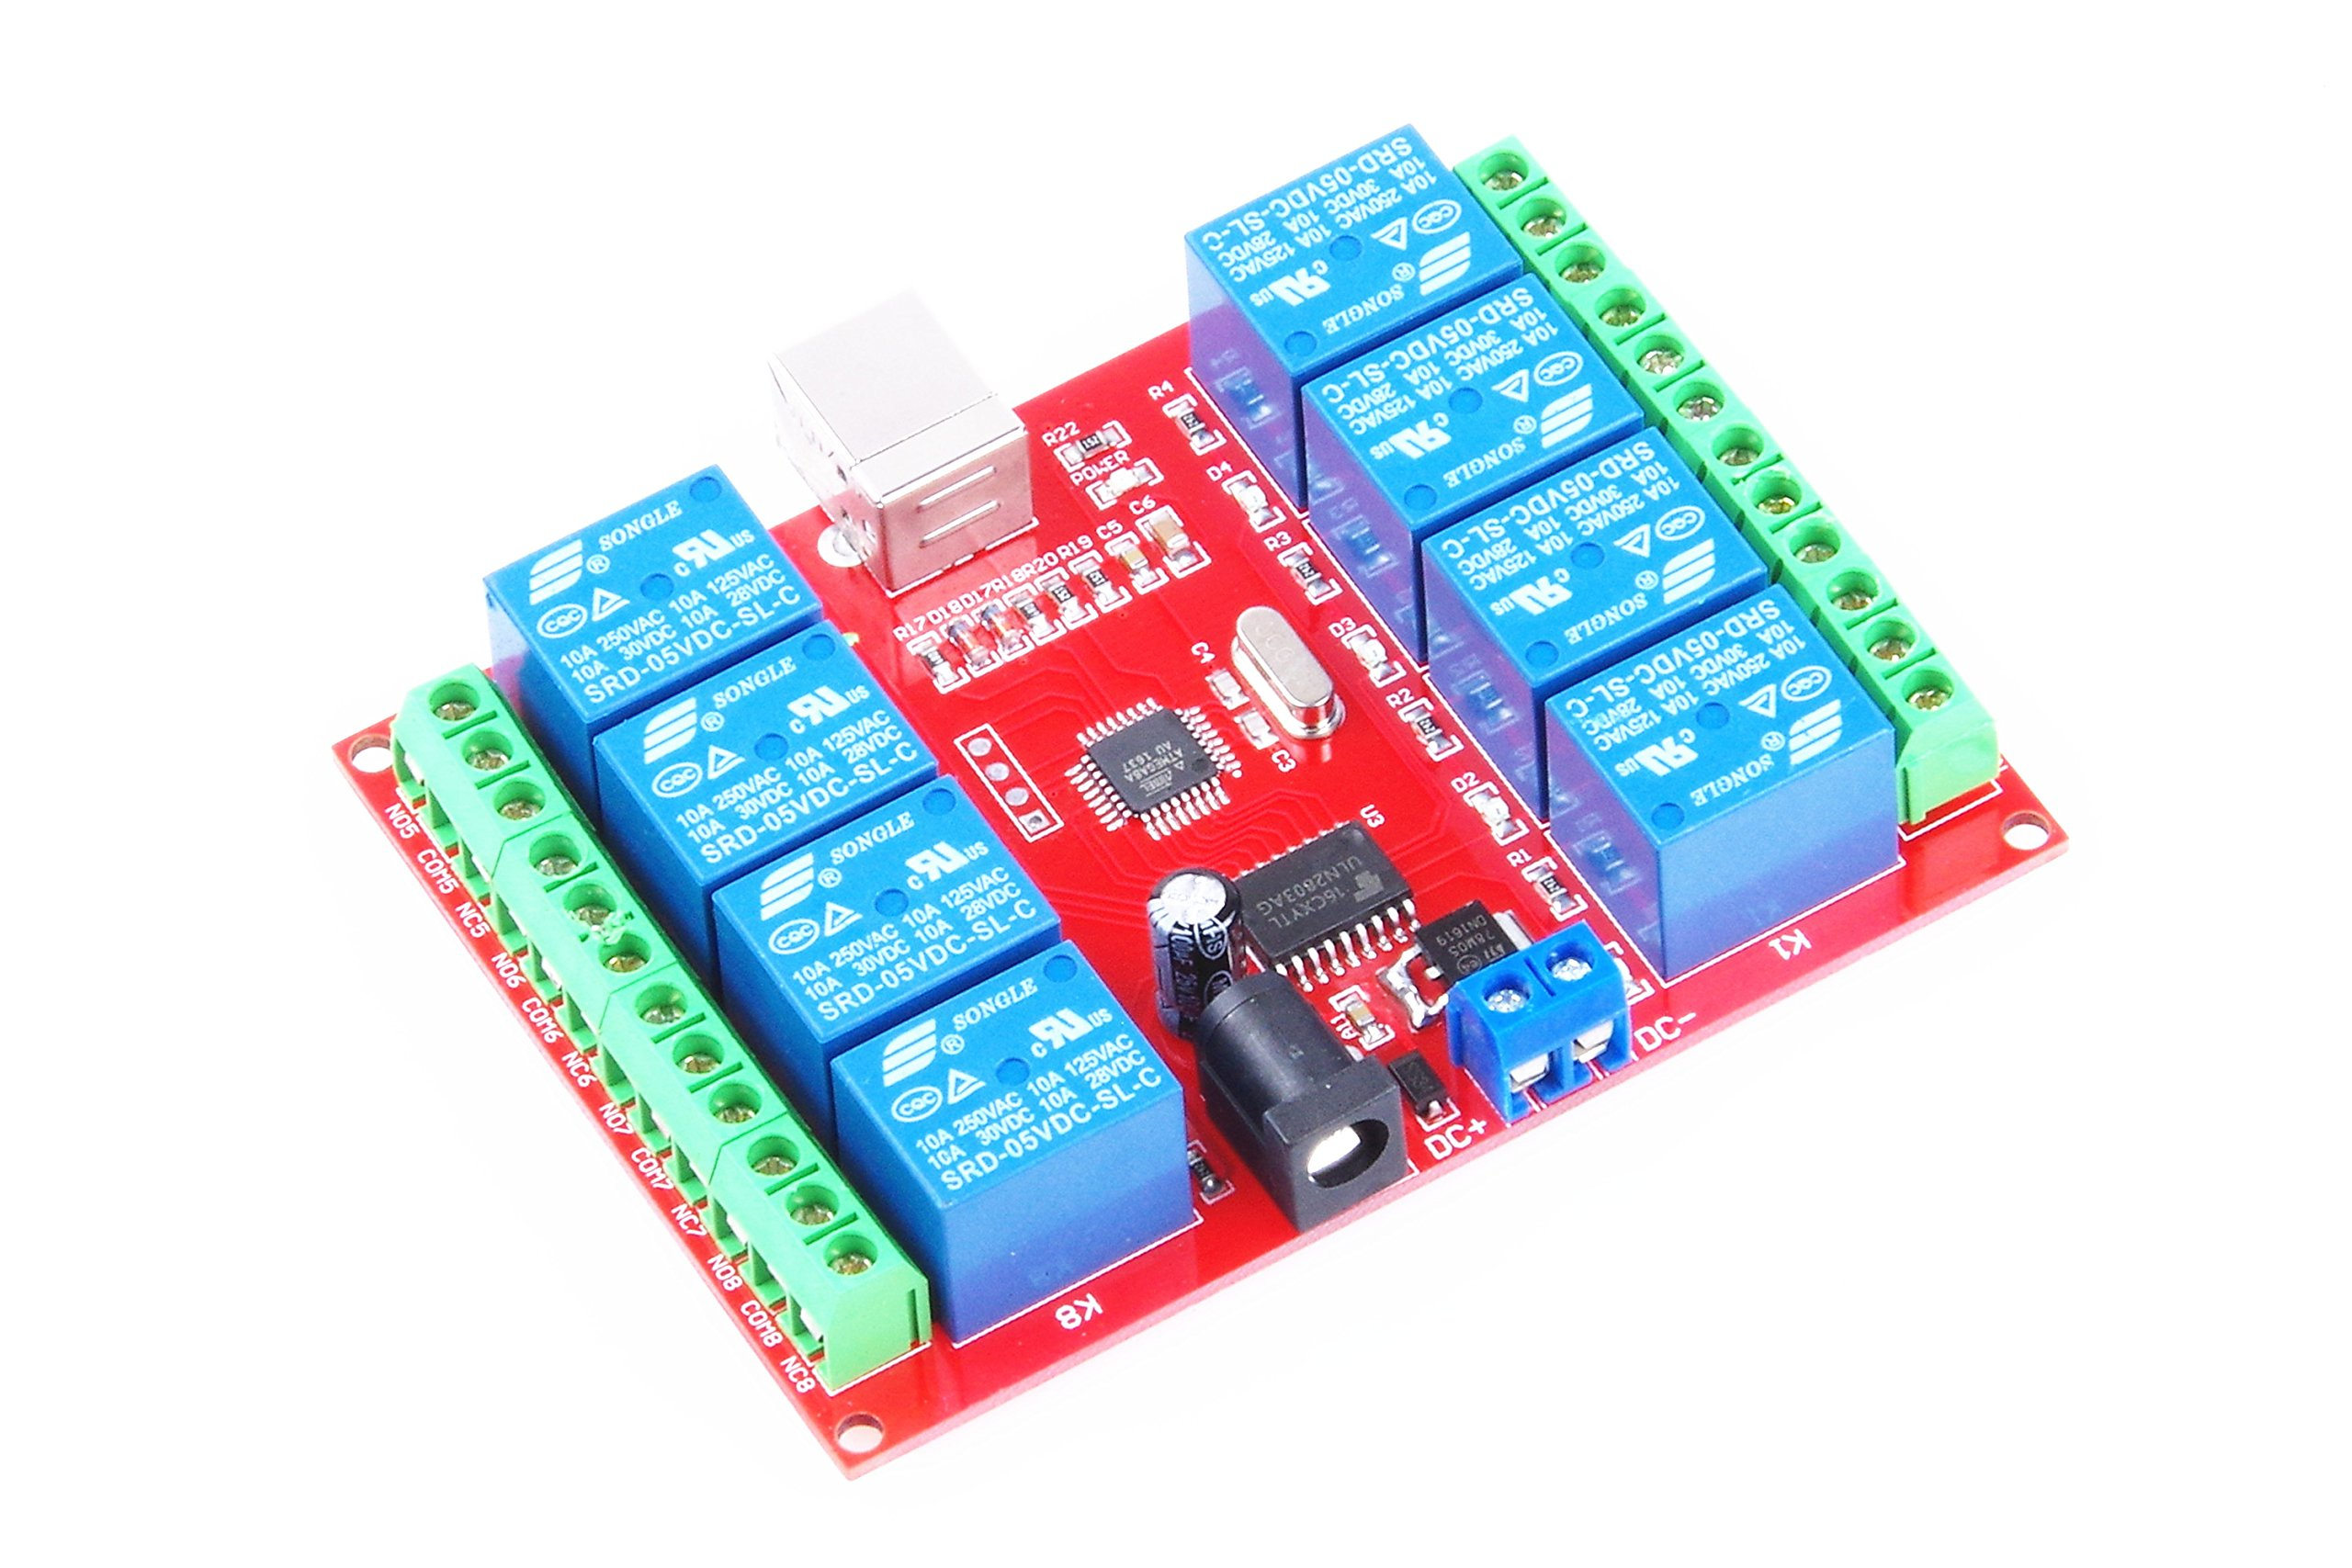 KNACRO SRD-05VDC-SL-C 8-way 5V Relay Module Free driver USB control switch PC intelligent control (5V 8-Channel)